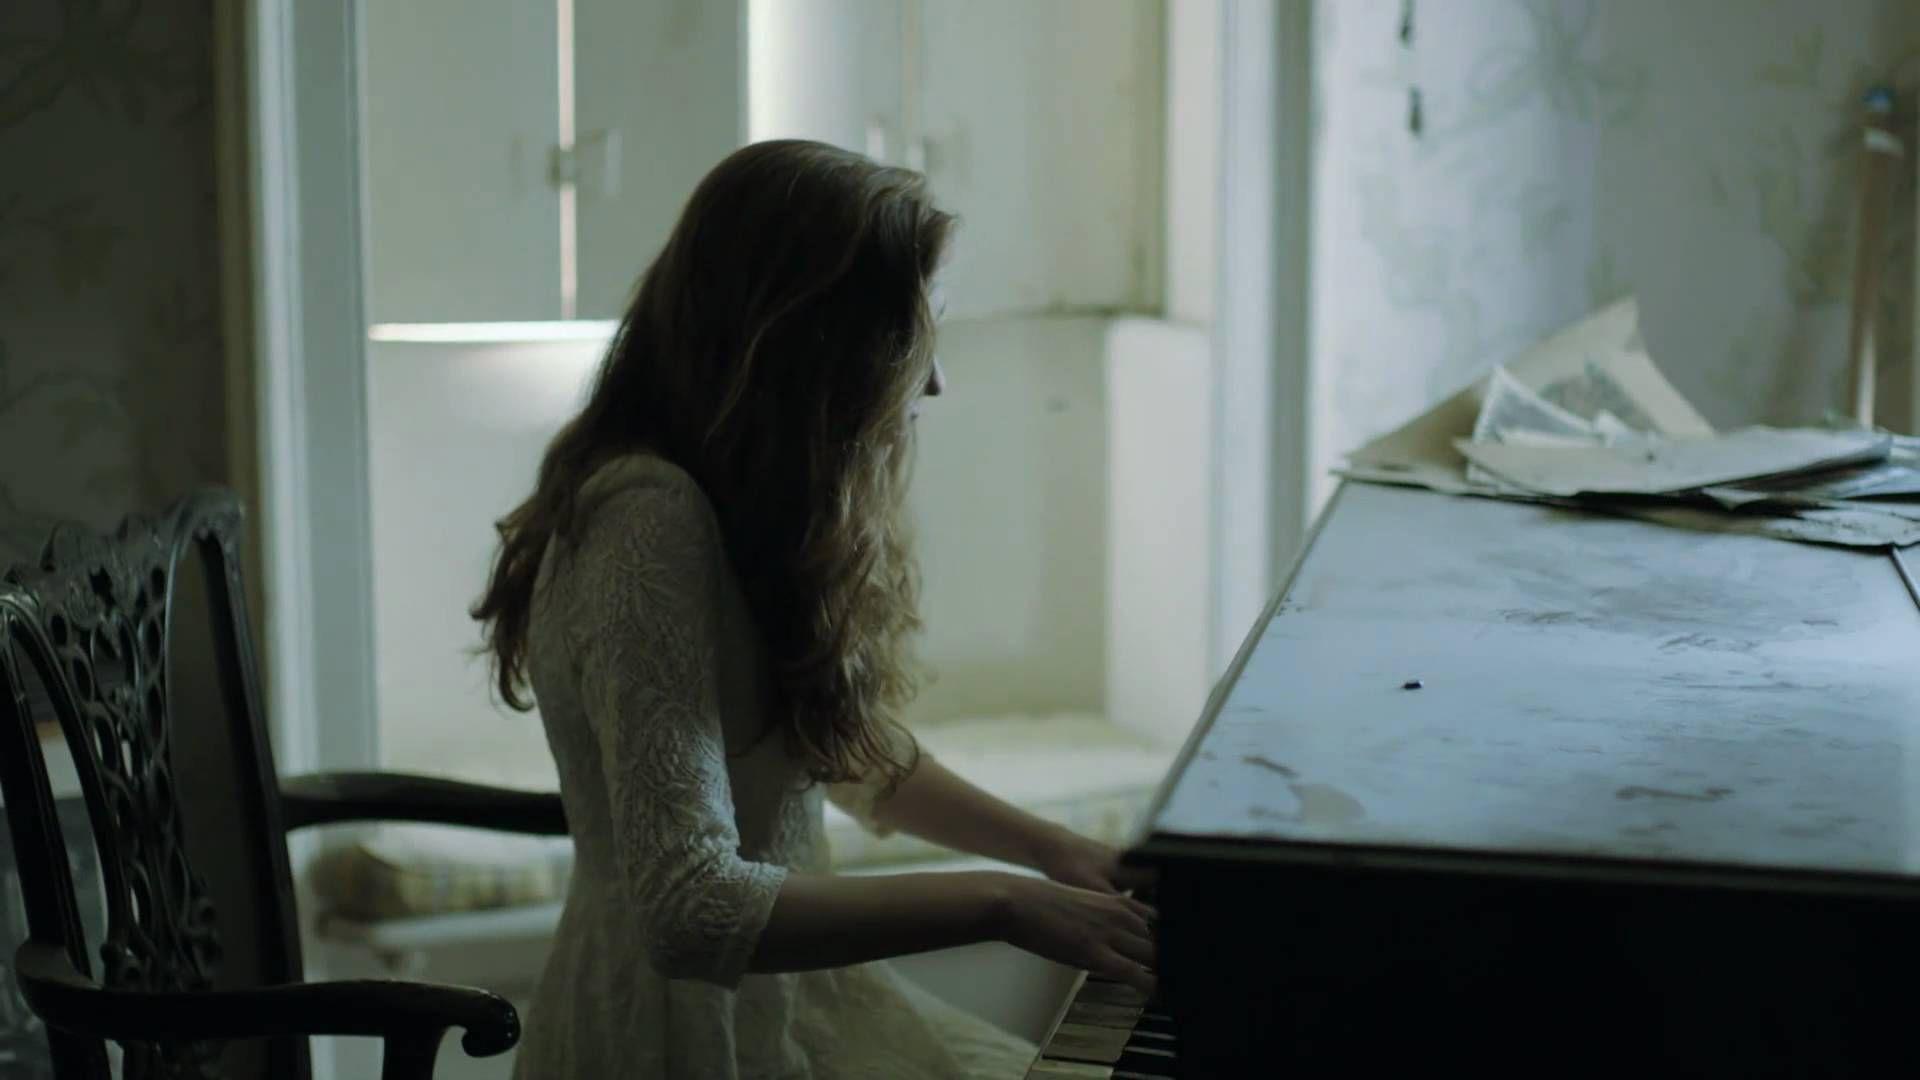 Birdy - Skinny Love [Official Music Video] all day y mas en fatimas churchh k dia ta rarooo !